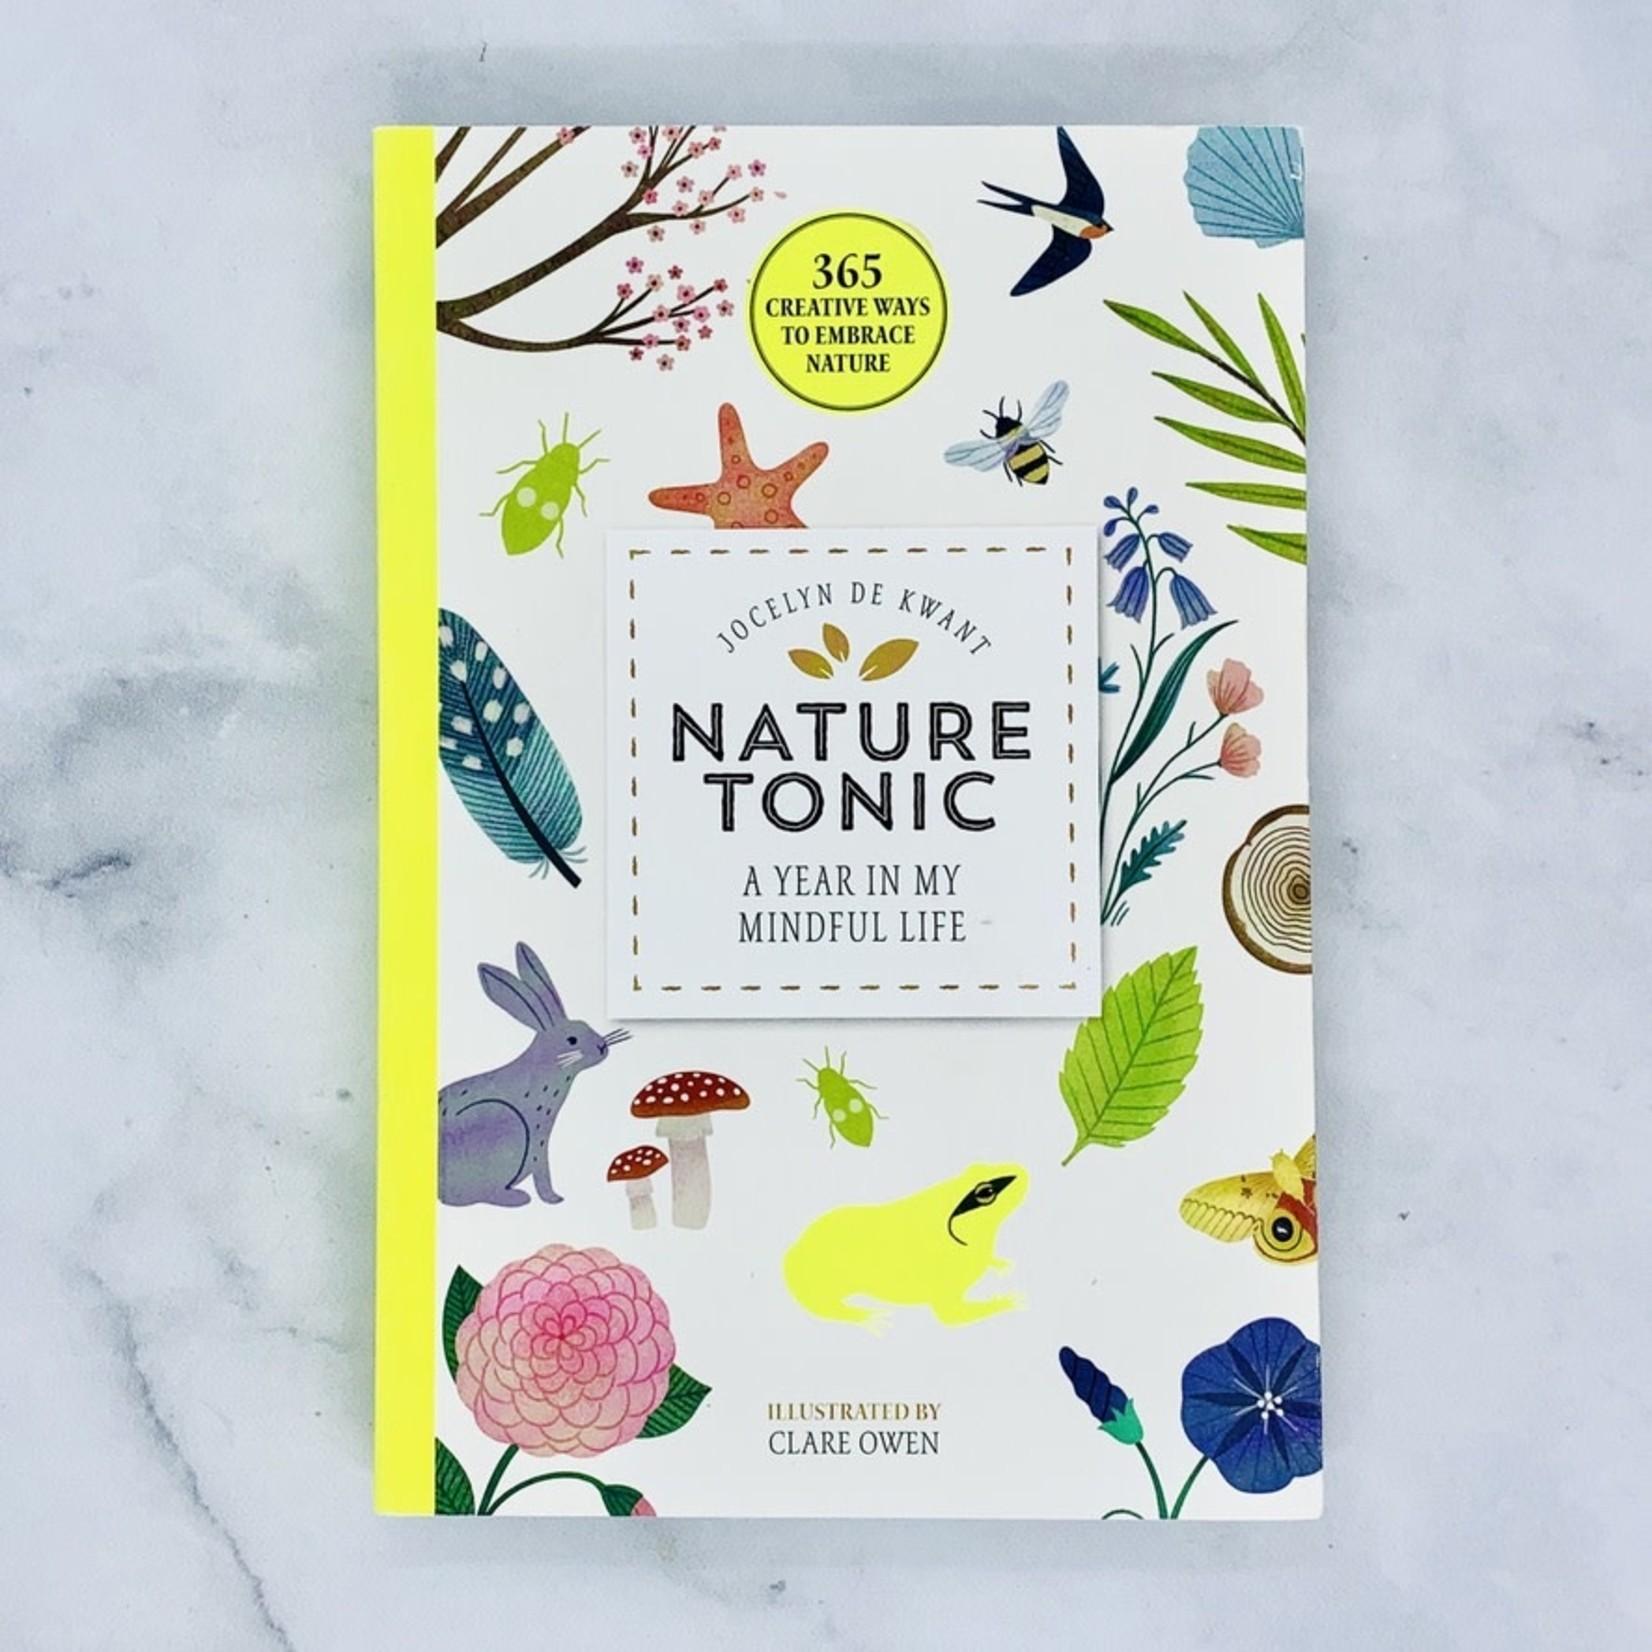 Nature Tonic